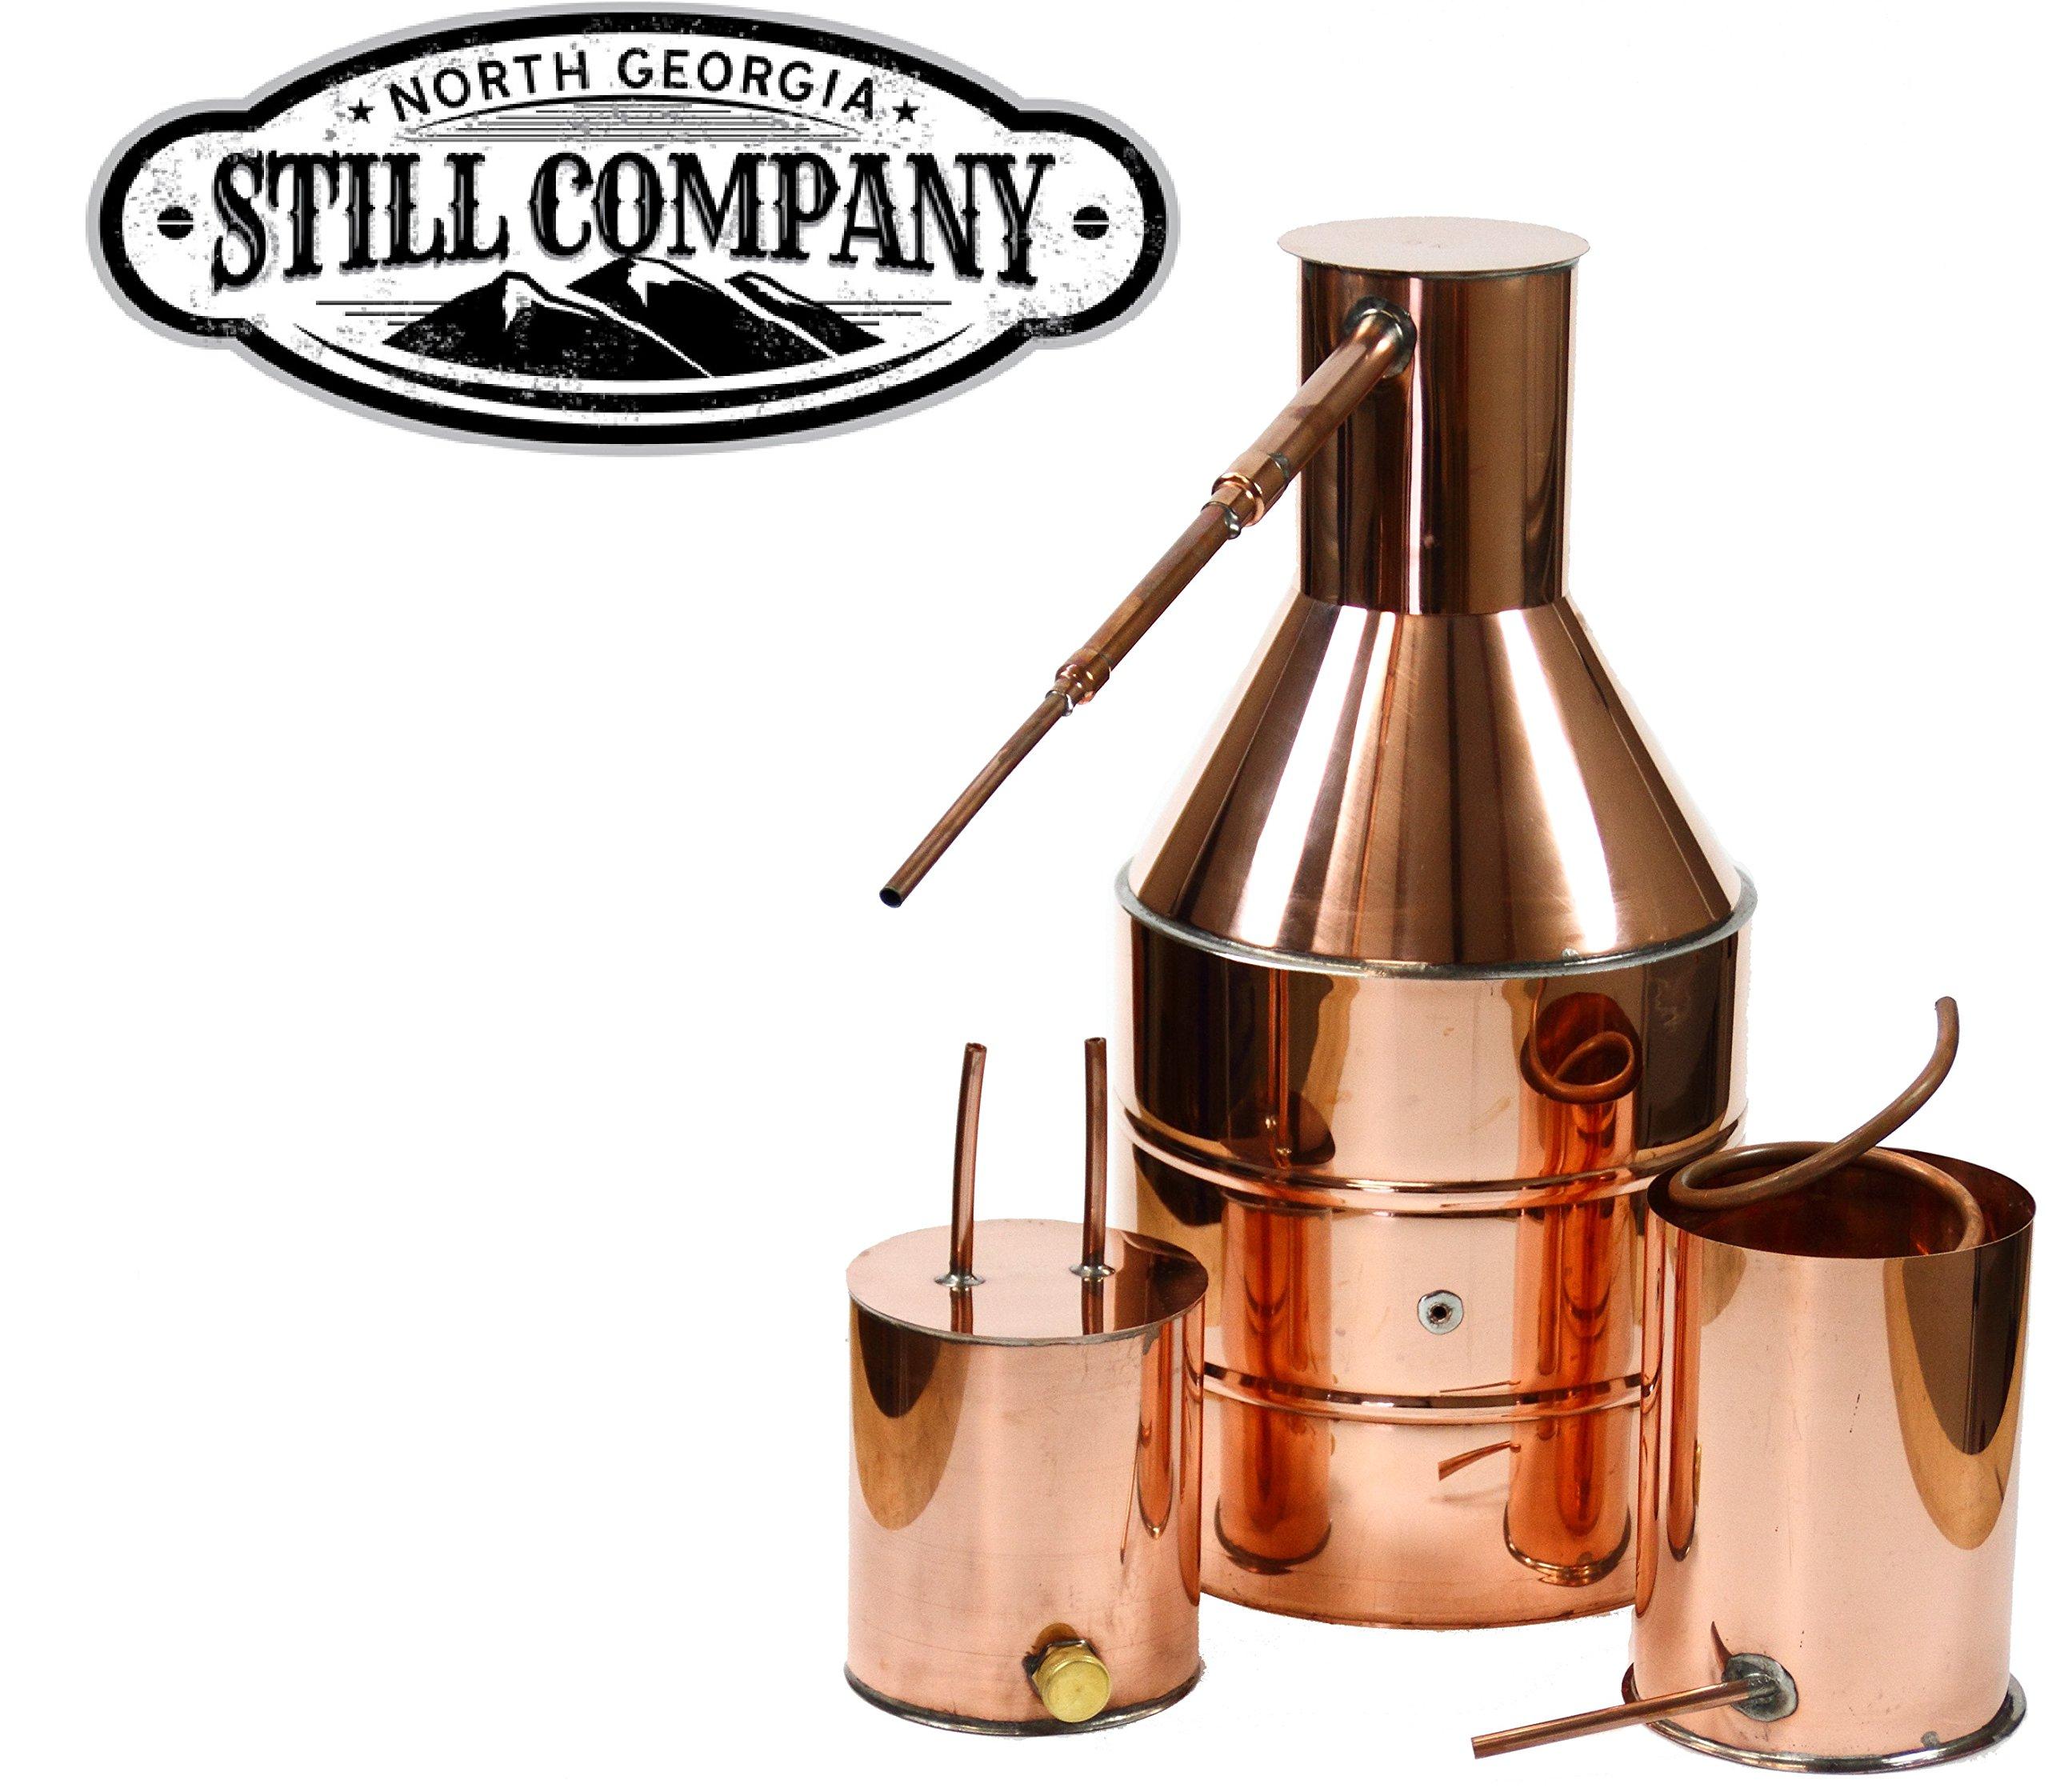 5 Gallon Copper Moonshine Still with Worm & Thumper by North Georgia Still Company